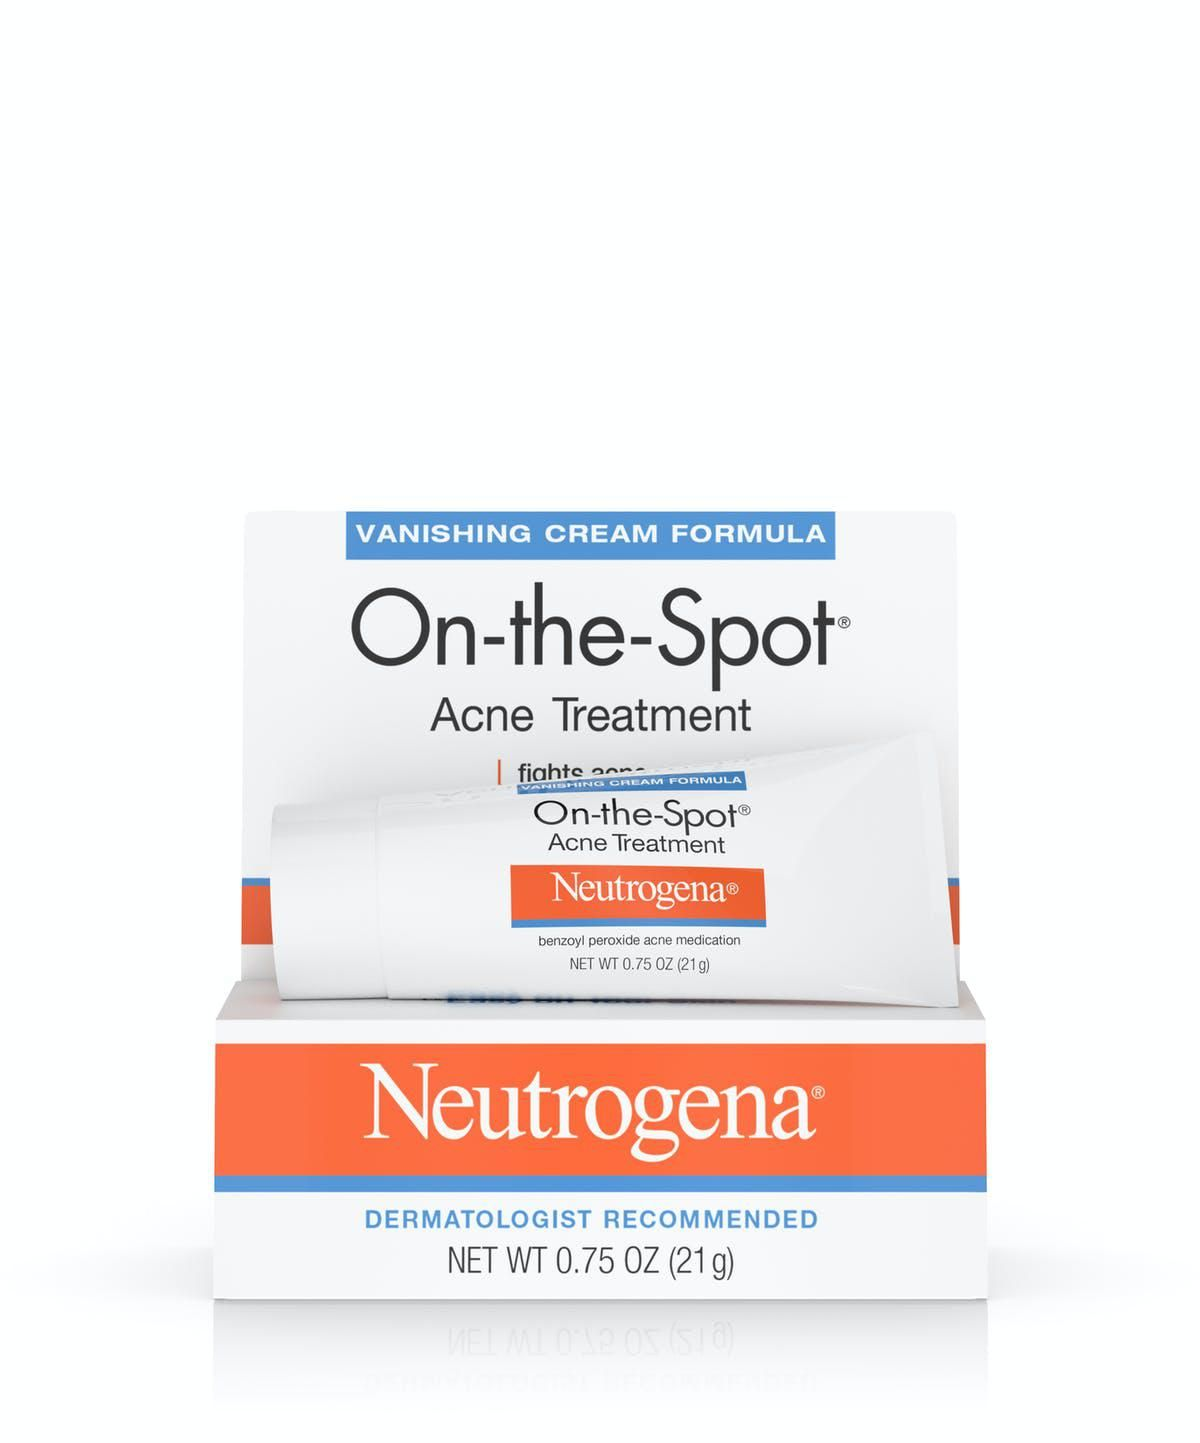 On the Spot Treatment